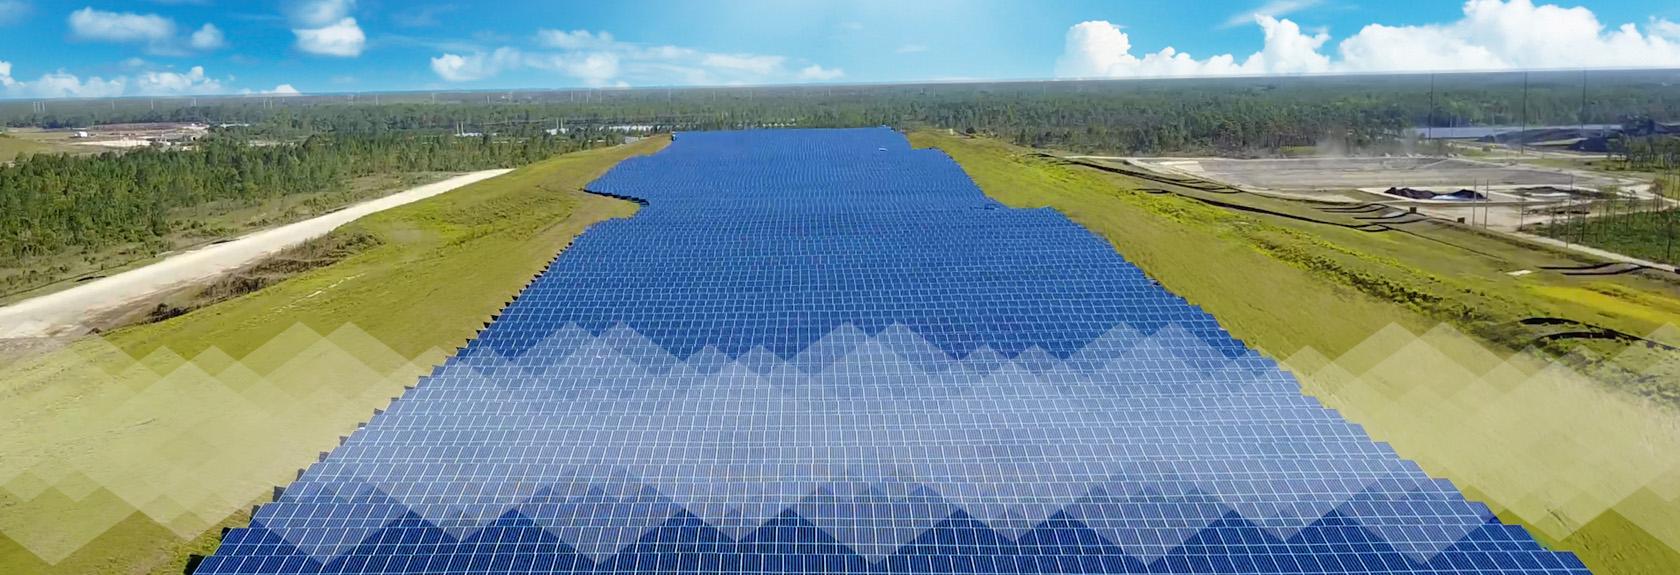 homepage_hero_stanton_solar?sfvrsn=2 myouc Altec Bucket Wiring-Diagram at gsmx.co